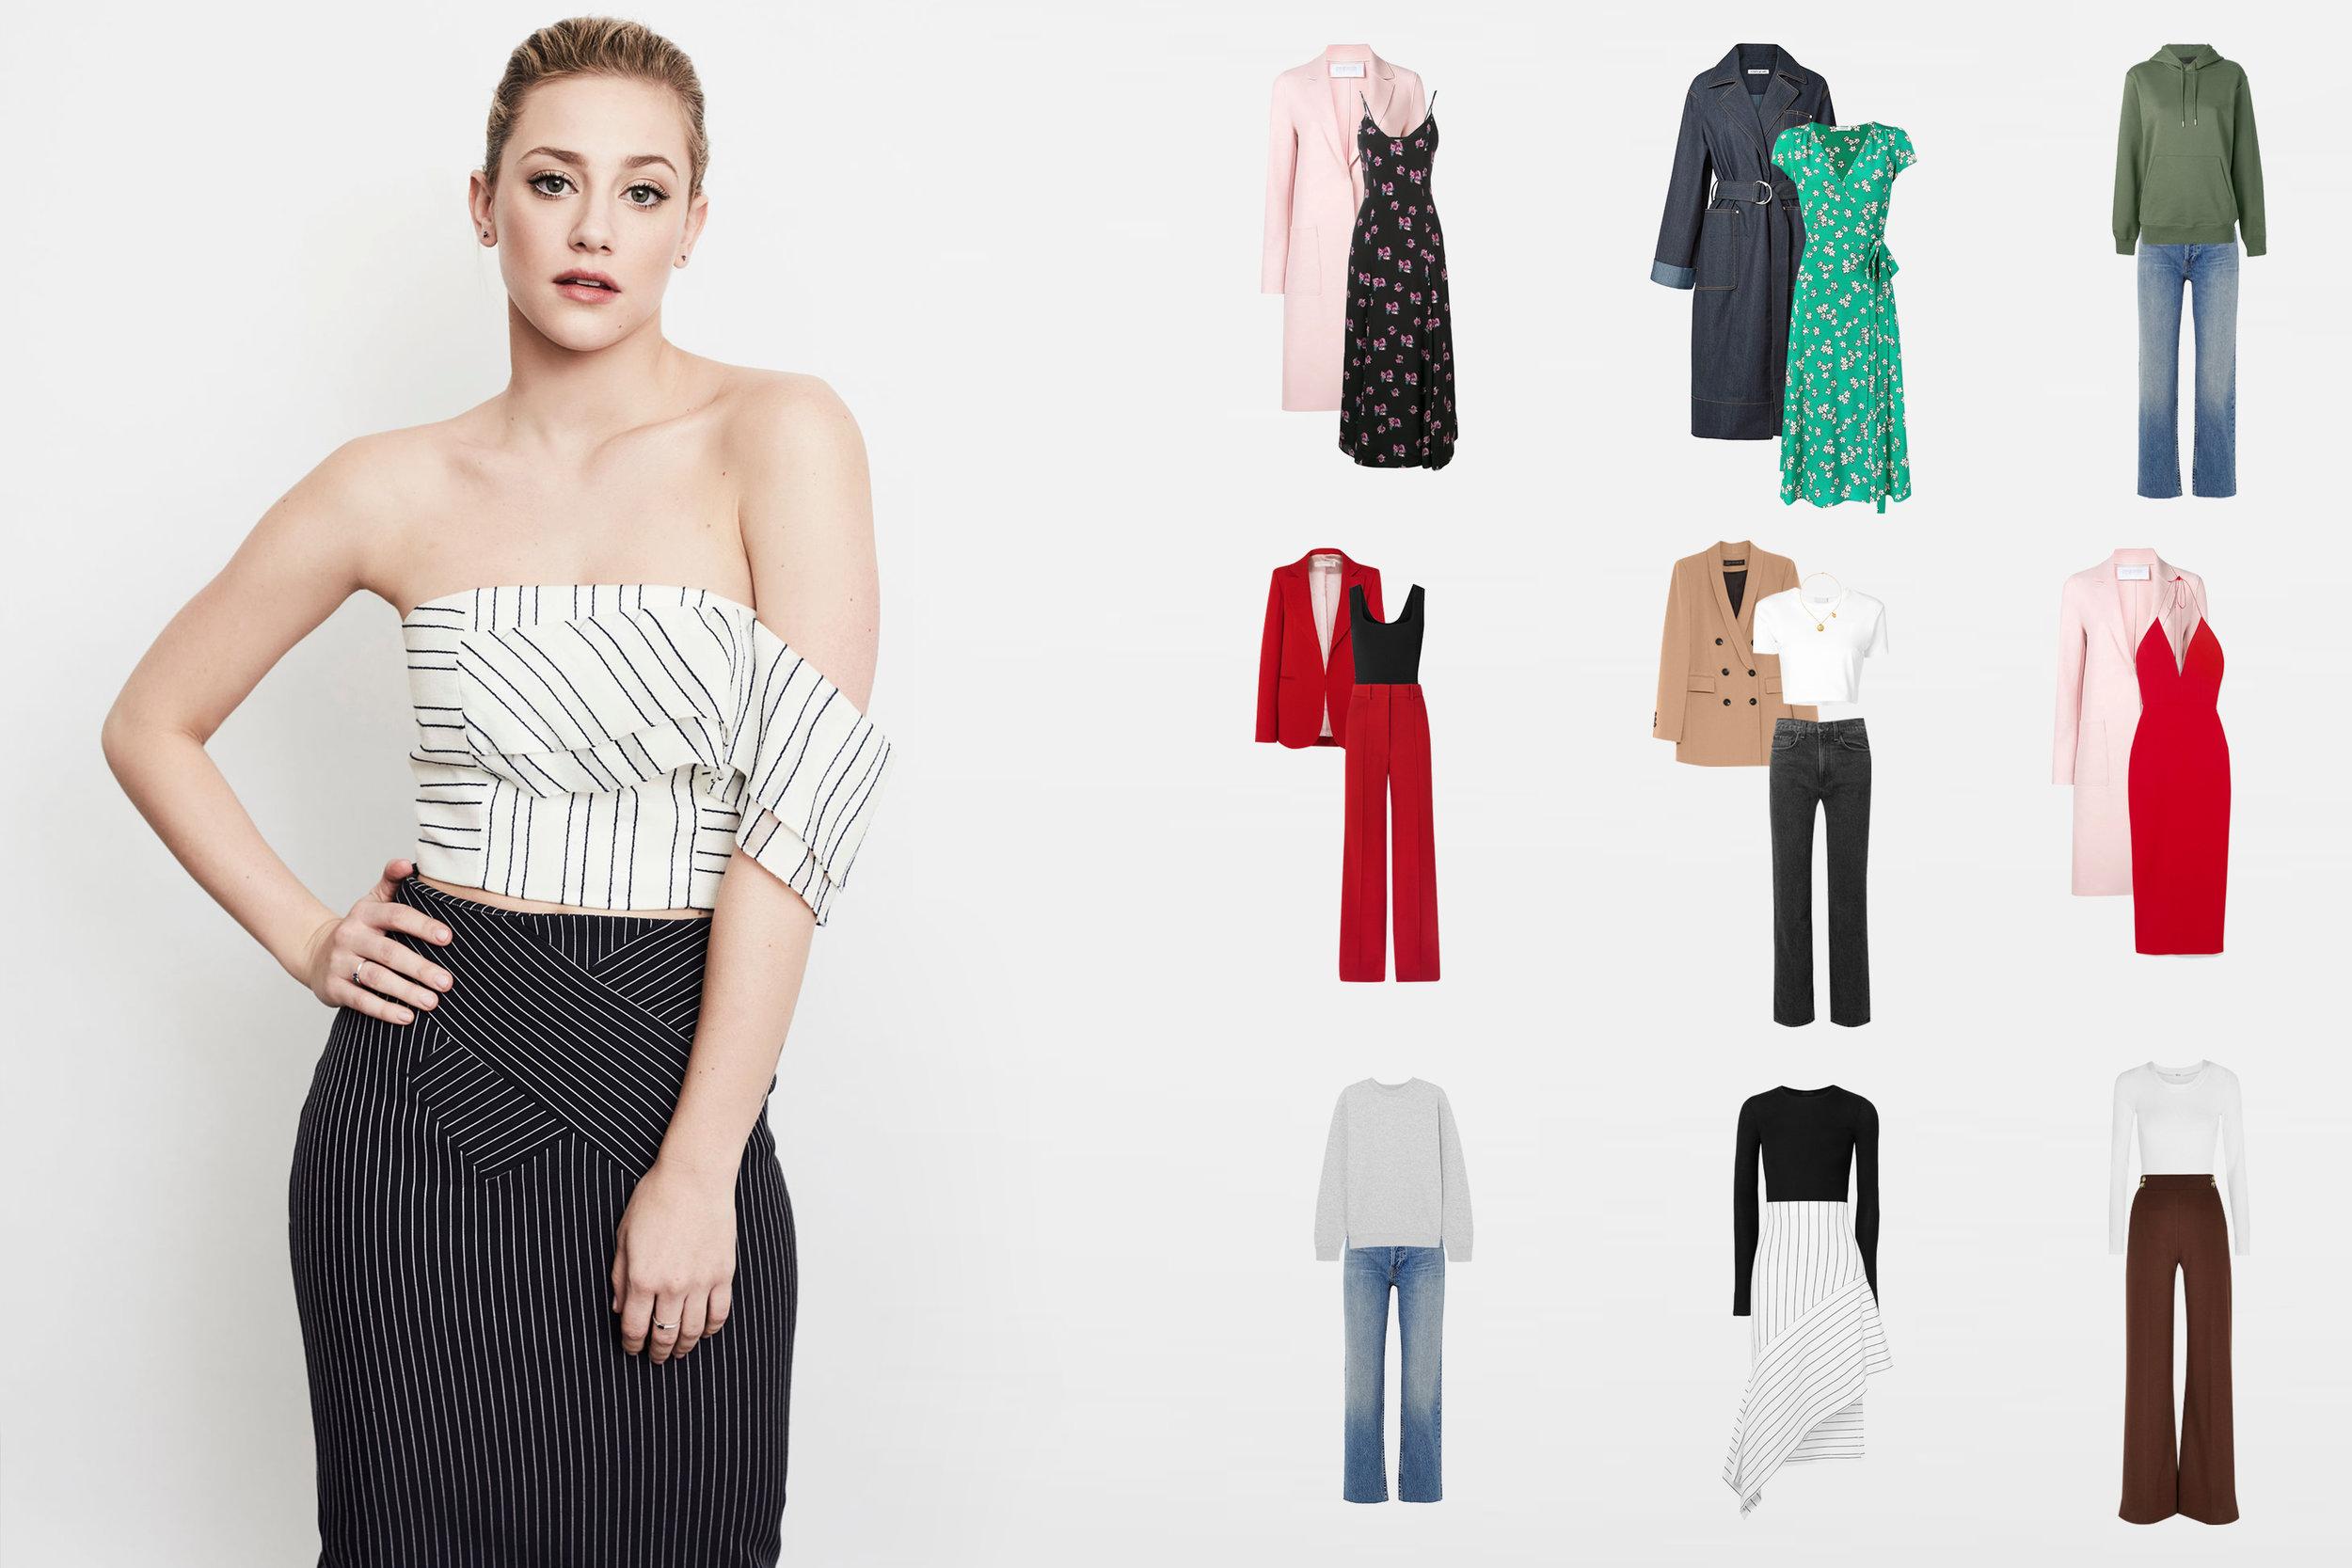 lili-reinhart-capsule-wardrobe-cover.jpg